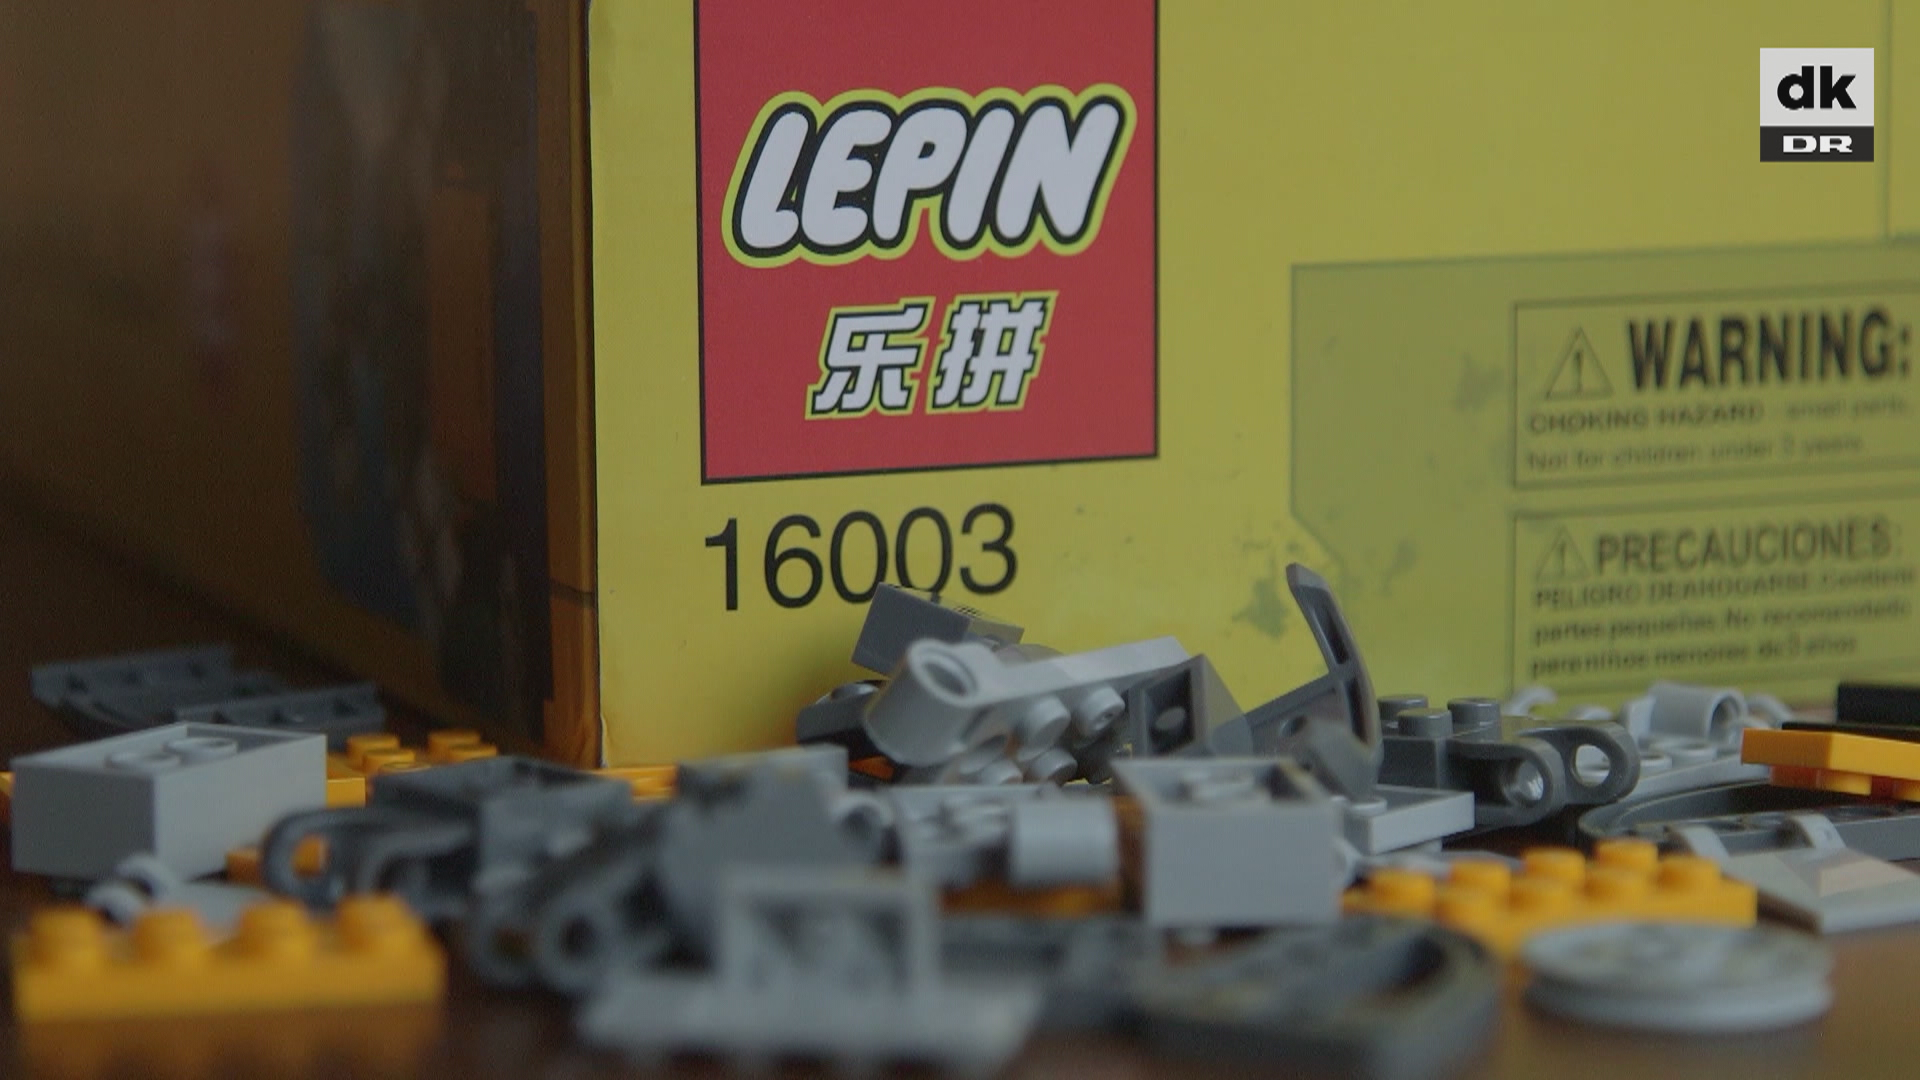 drdk_lego_lepin_fb_00002124.jpeg